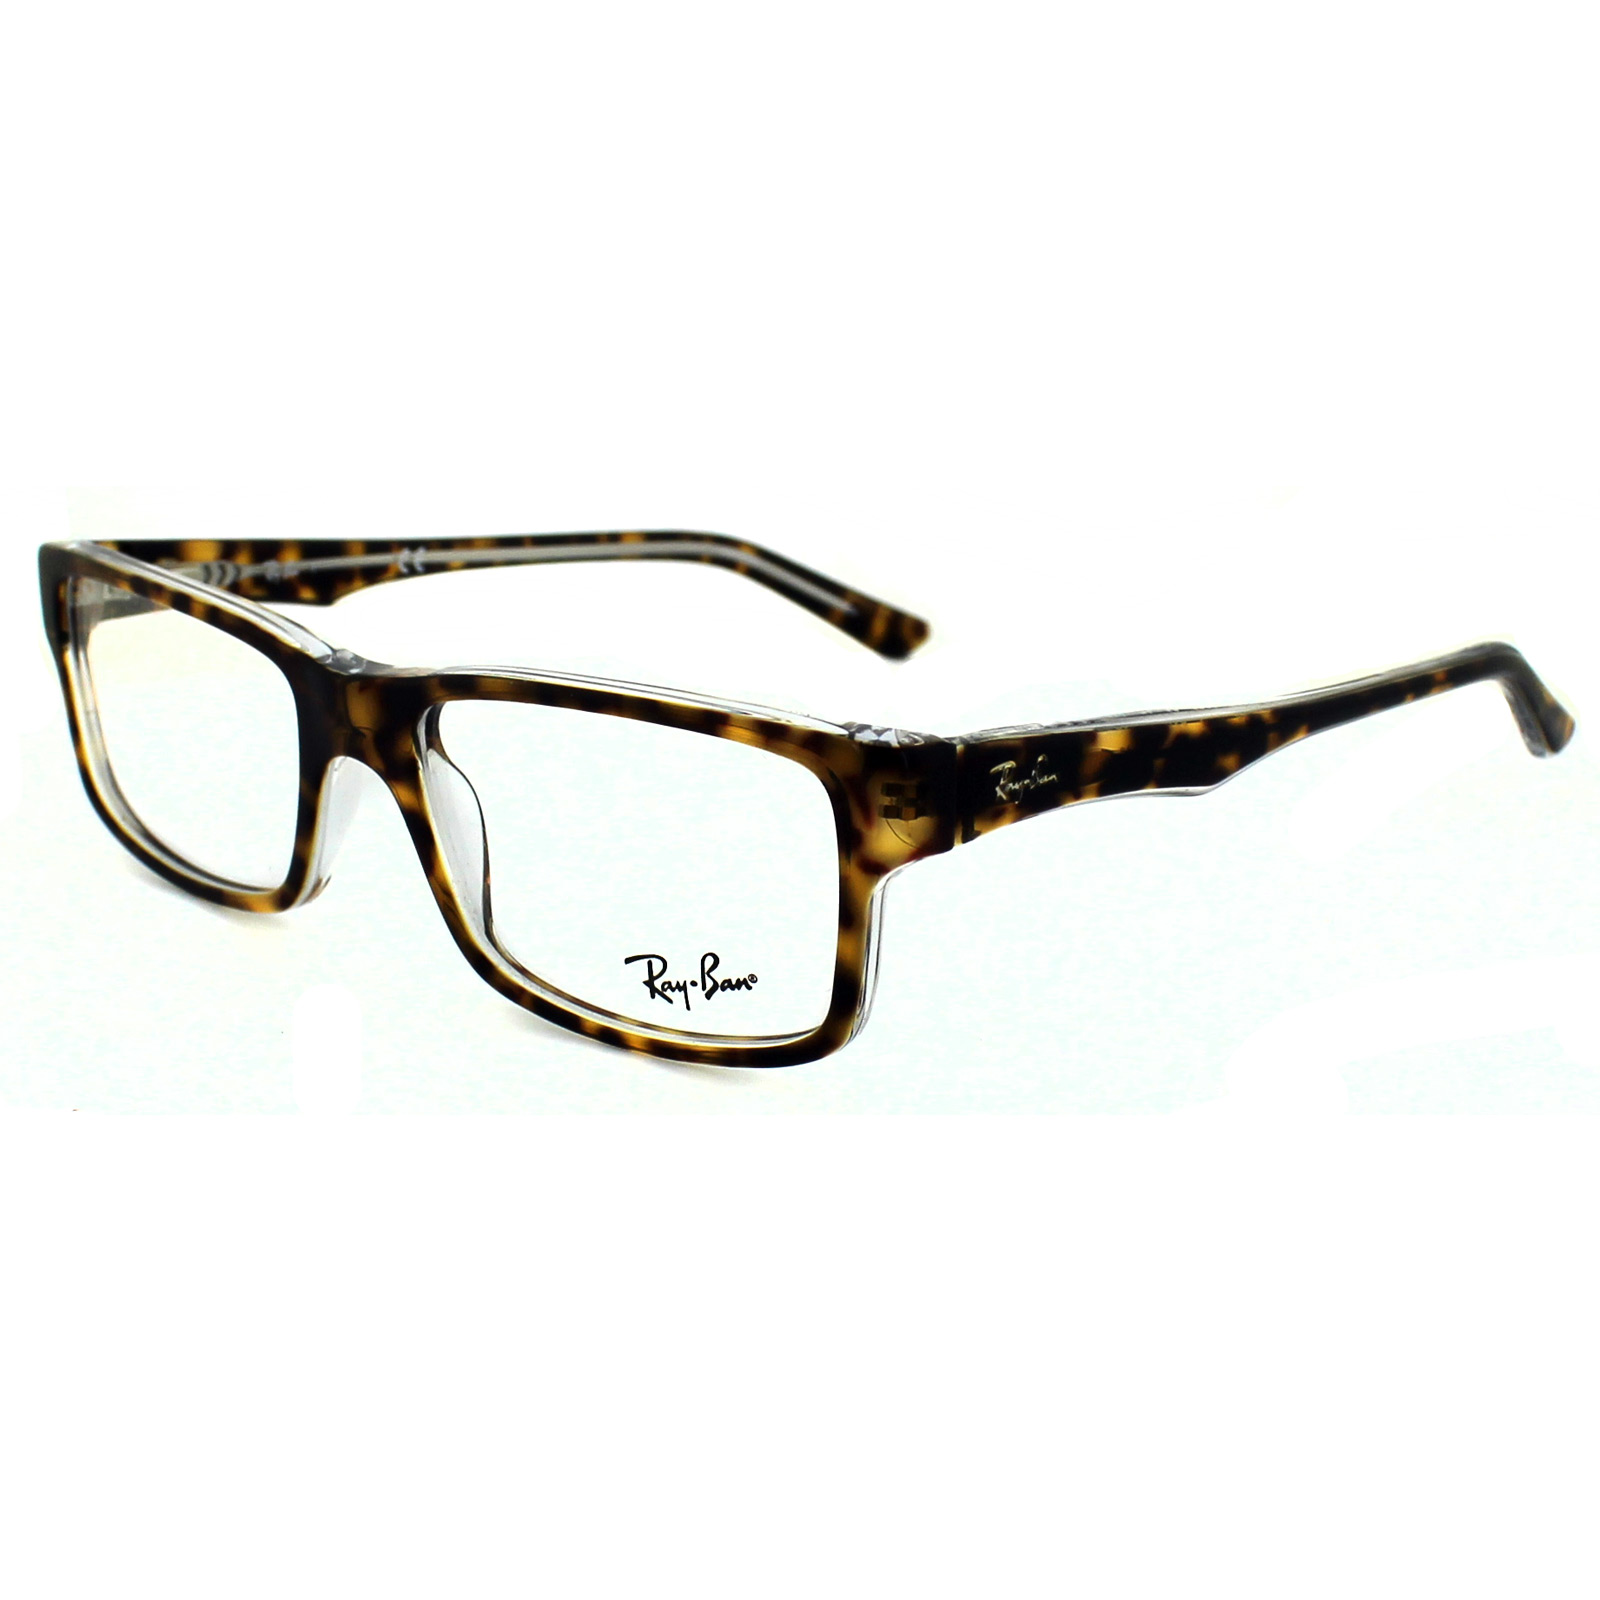 Ray Ban Eyeglasses Rx